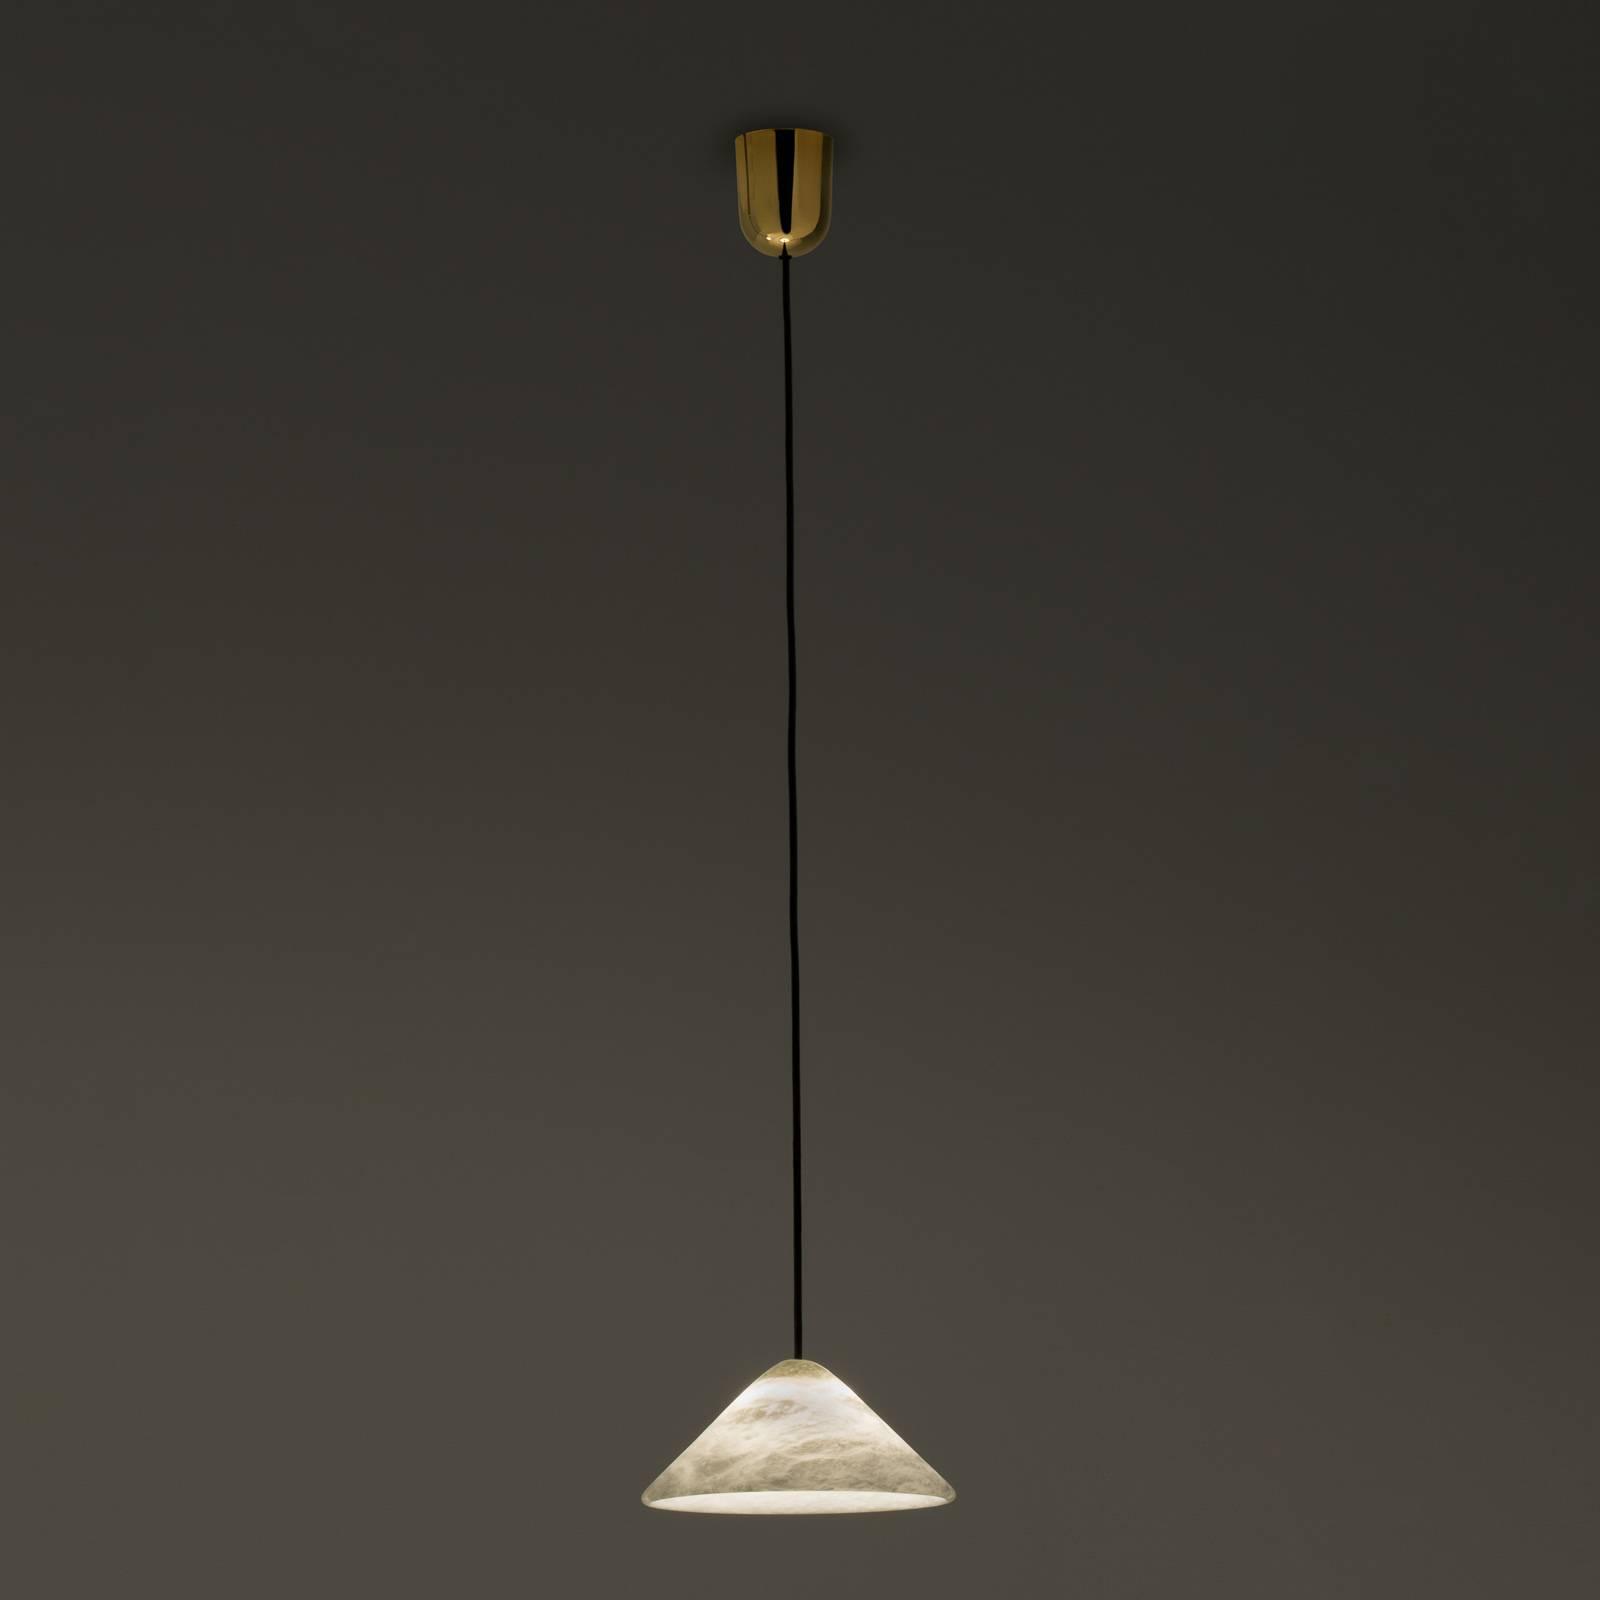 LED hanglamp Fuji van albast Ø 21 cm